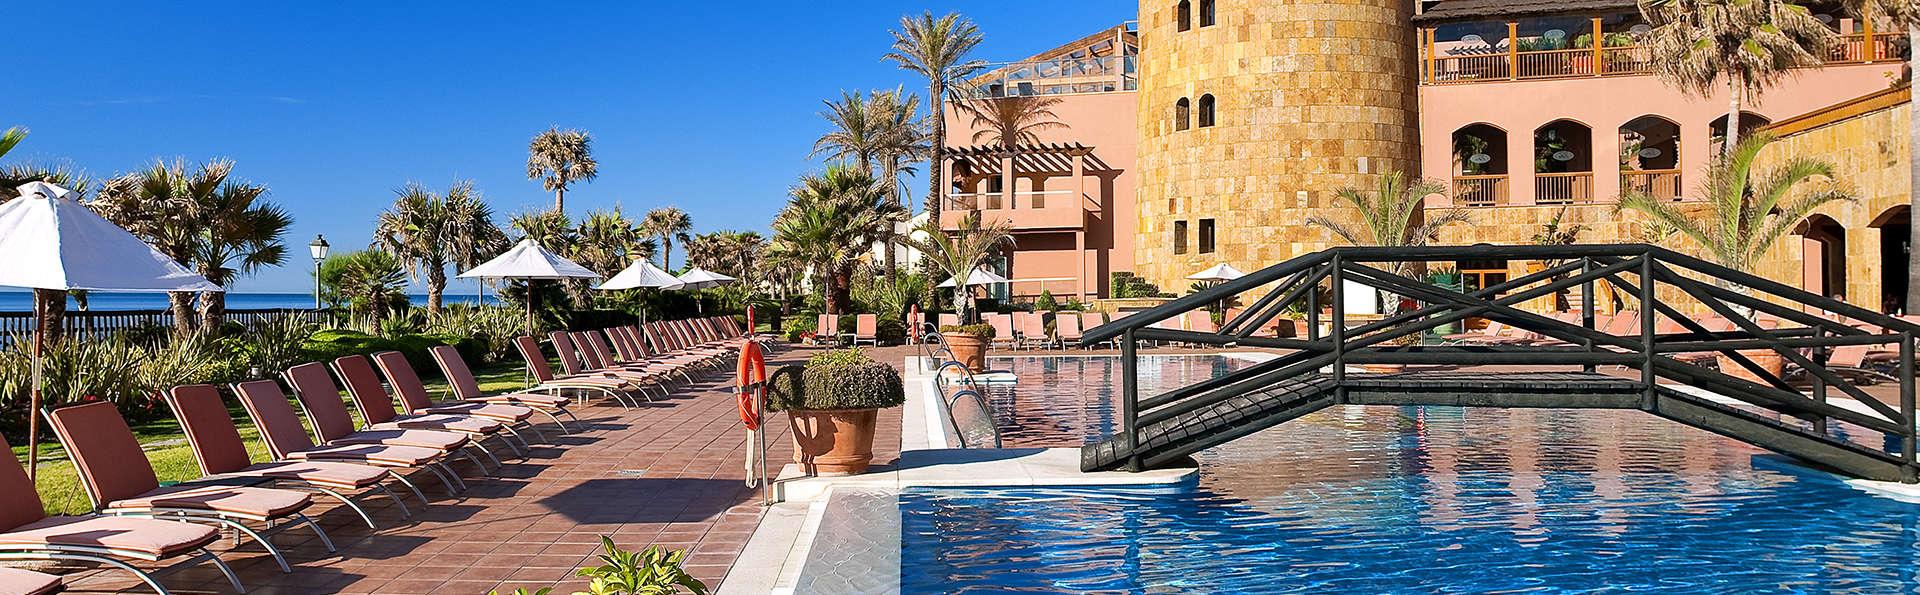 Elba Estepona Gran Hotel & Thalasso Spa - EDIT_piscina11.jpg